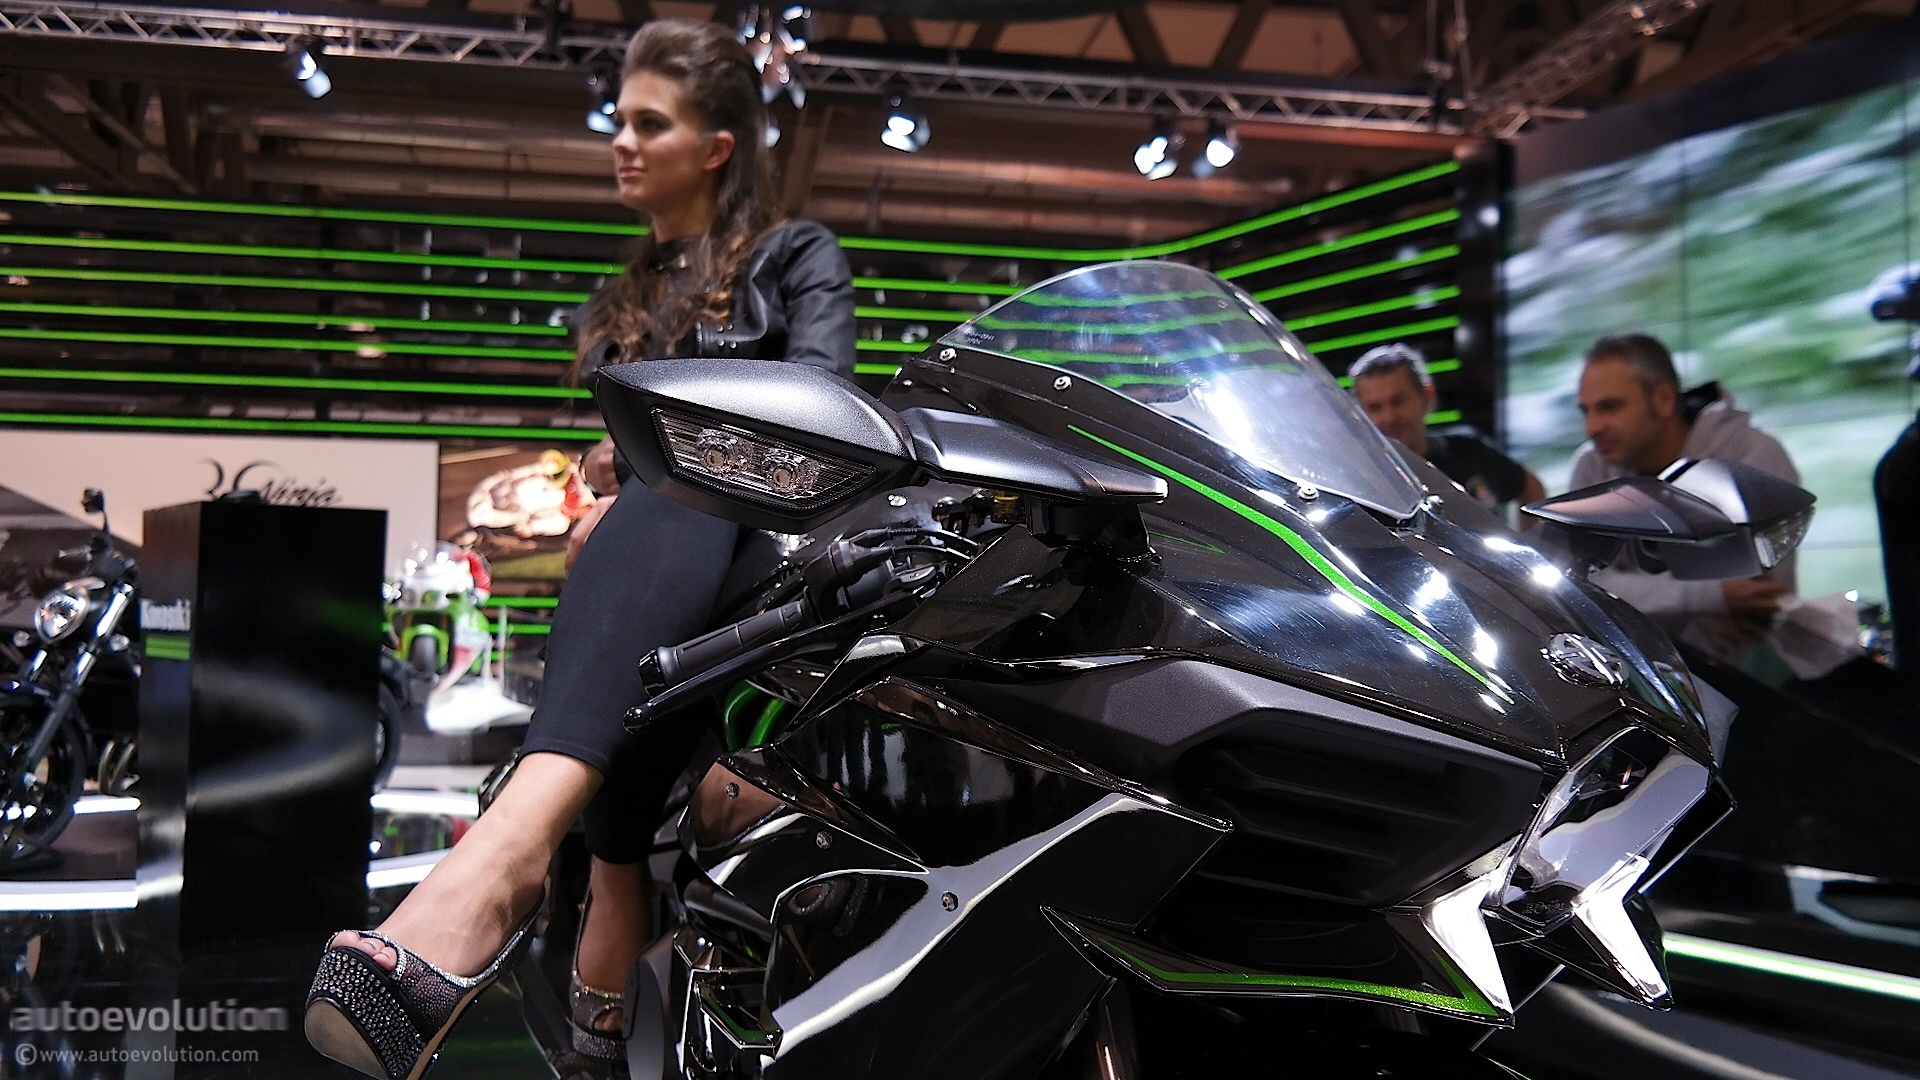 Kawasaki Ninja H2 Goes To India Price Doubles Autoevolution